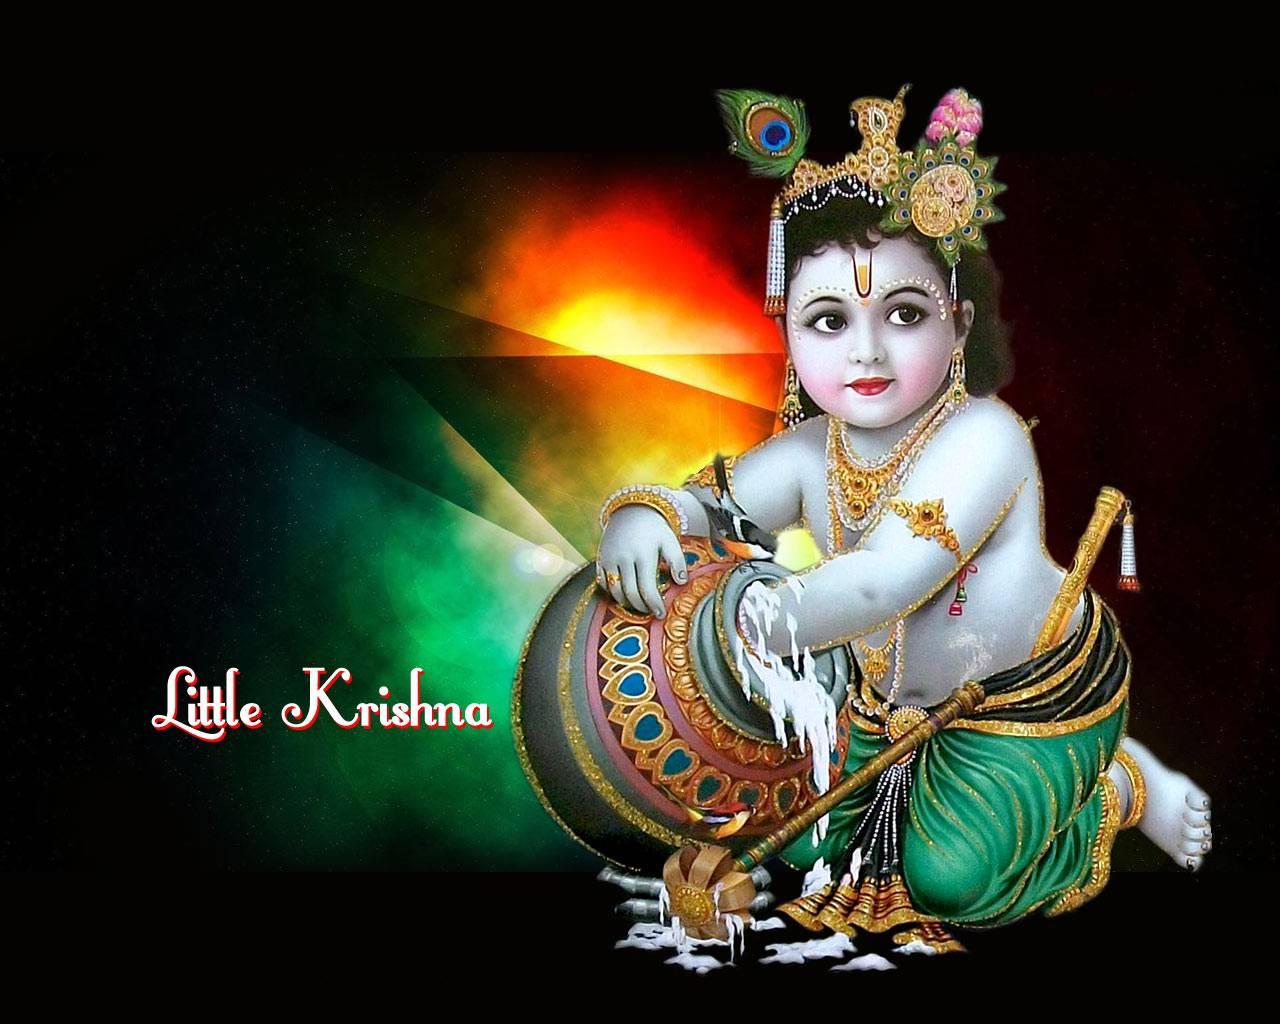 Baby Krishna Wallpapers Wallpaper Cave